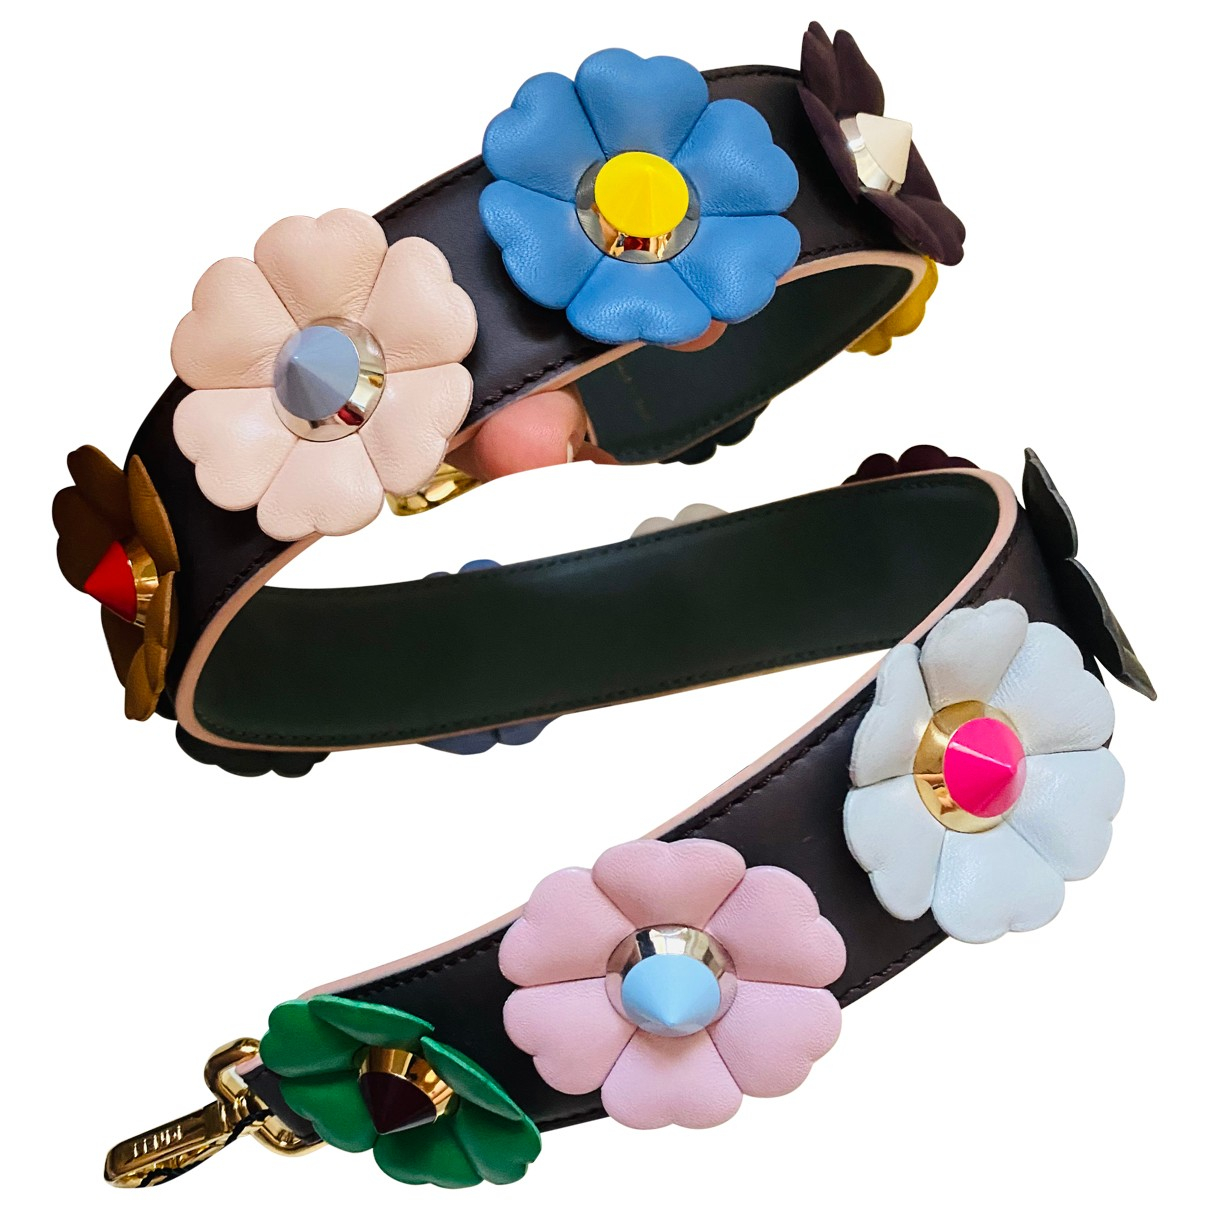 Fendi N Multicolour Leather Purses, wallet & cases for Women N